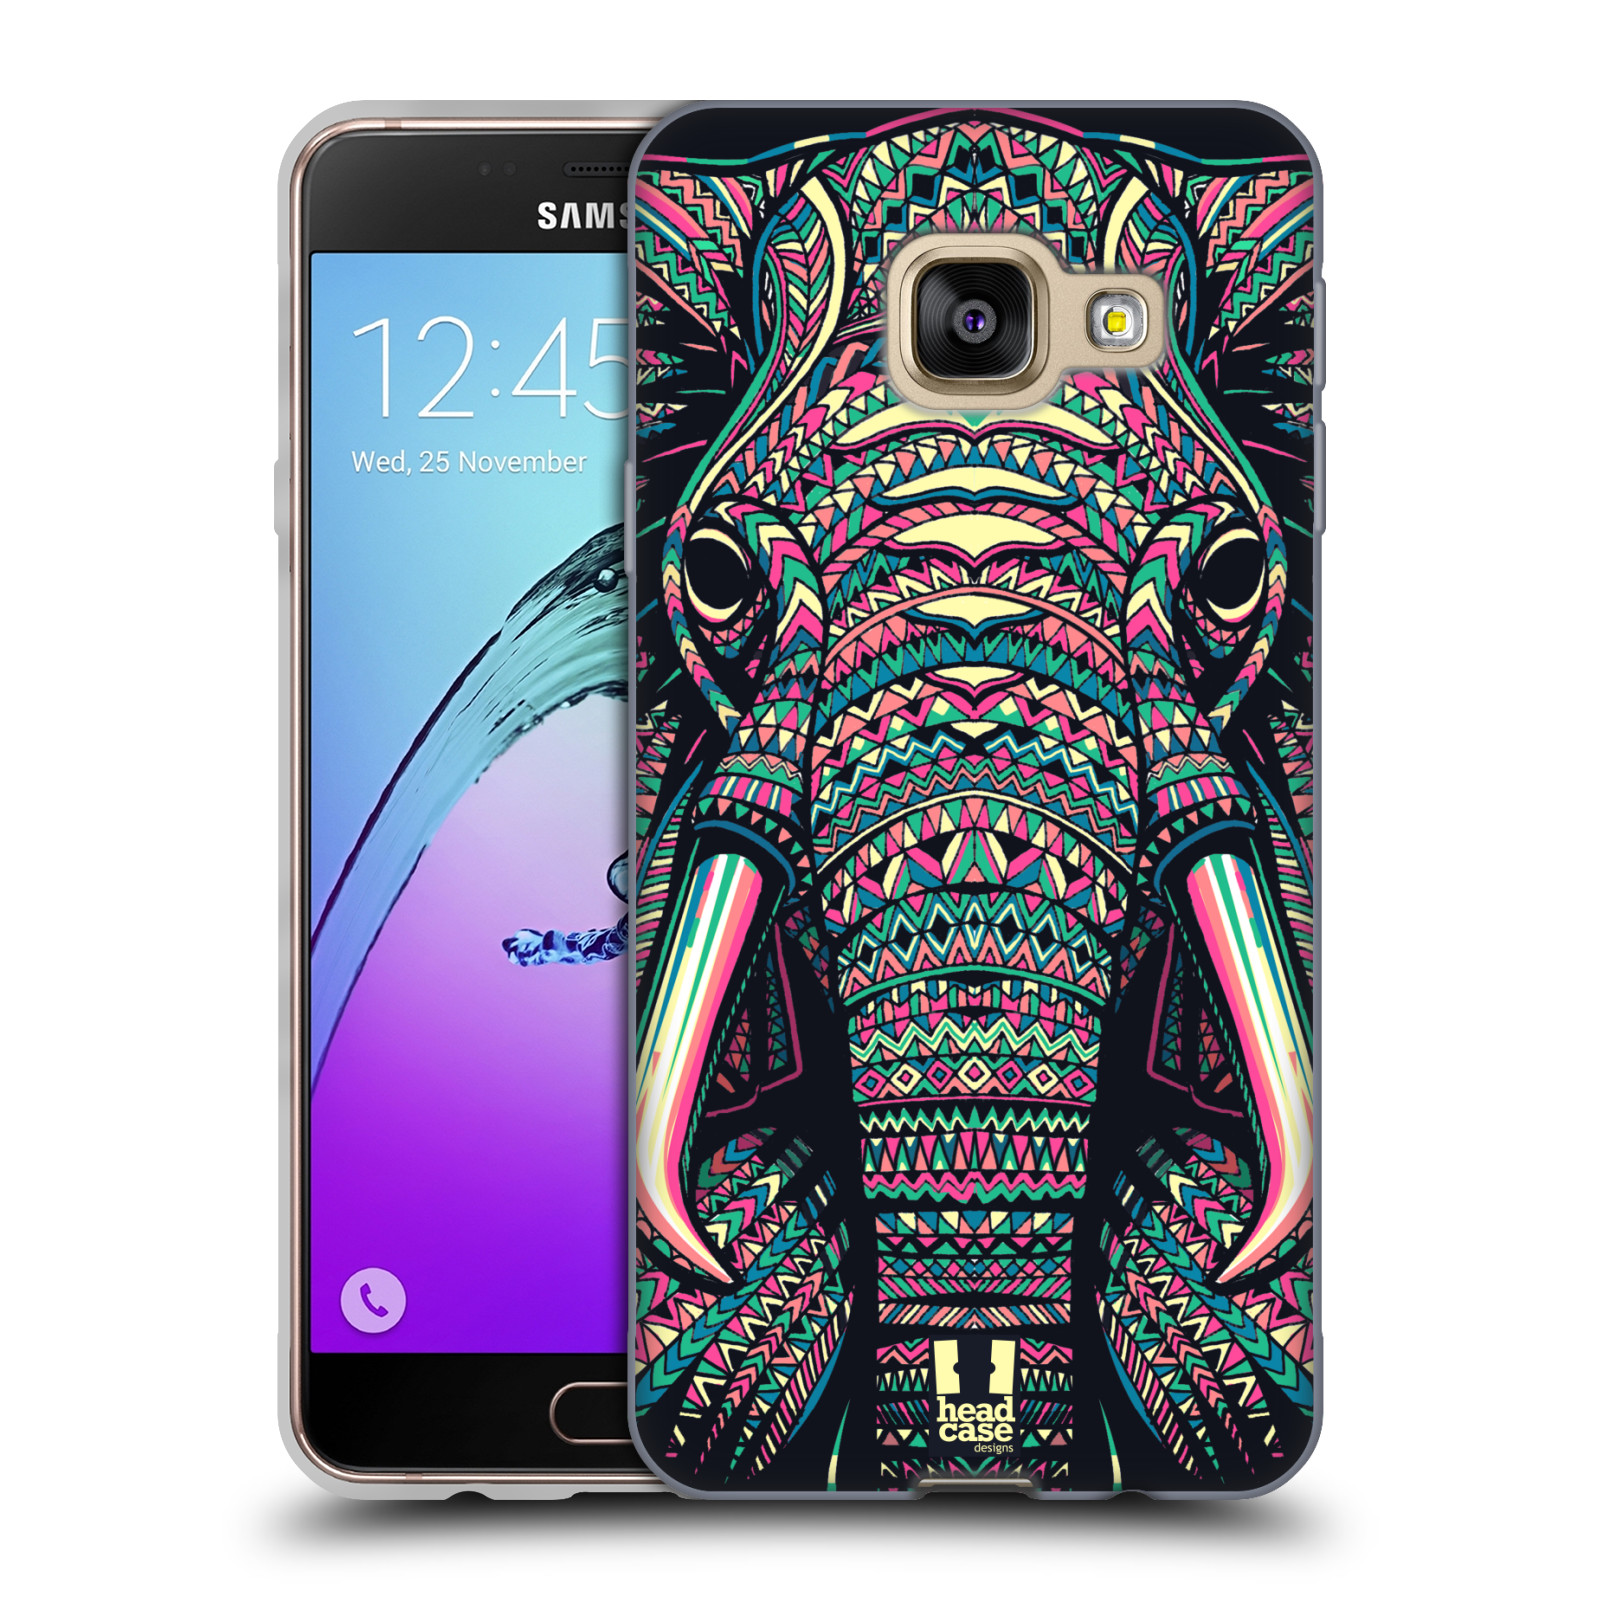 Silikonové pouzdro na mobil Samsung Galaxy A3 (2016) HEAD CASE AZTEC SLON